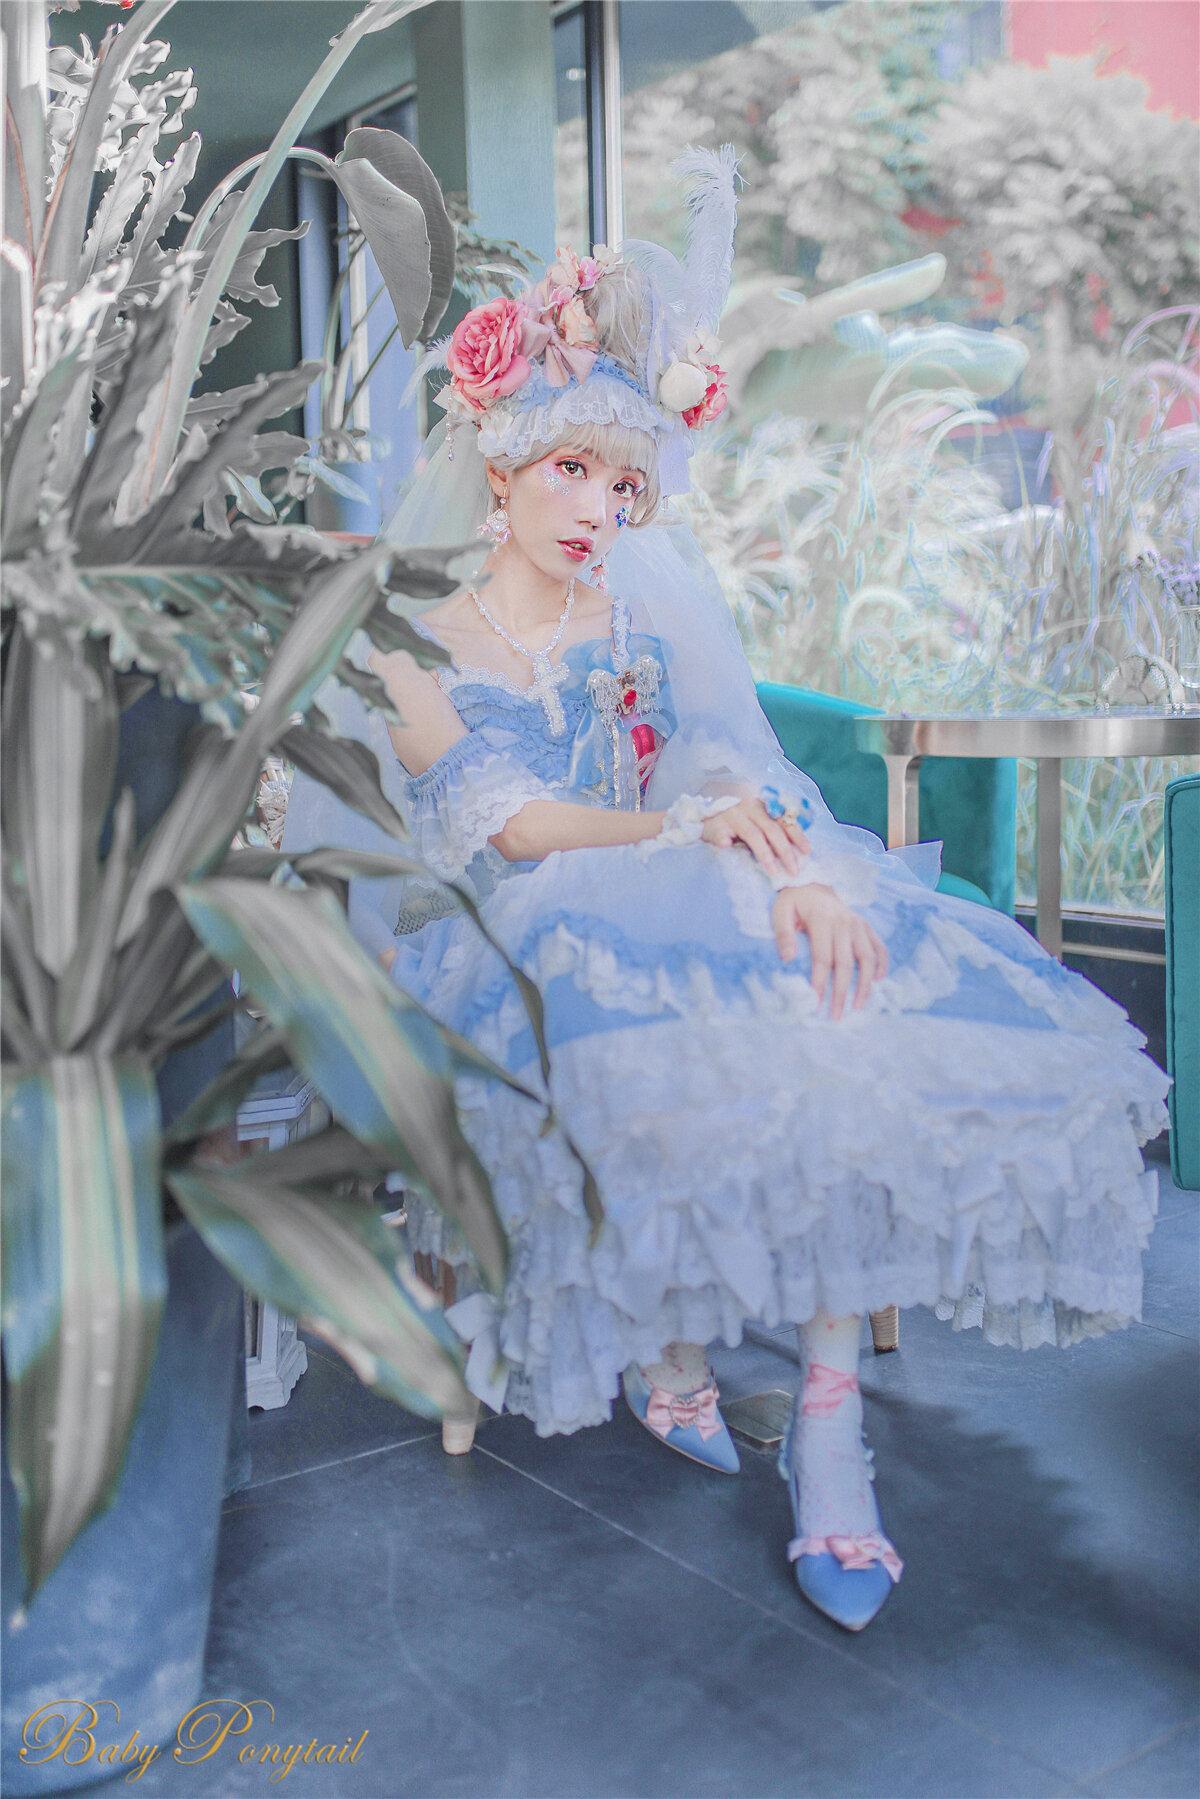 Babyponytail_Heavenly Teardrops_Model photo_JSK SAX_KAKA_20.jpg